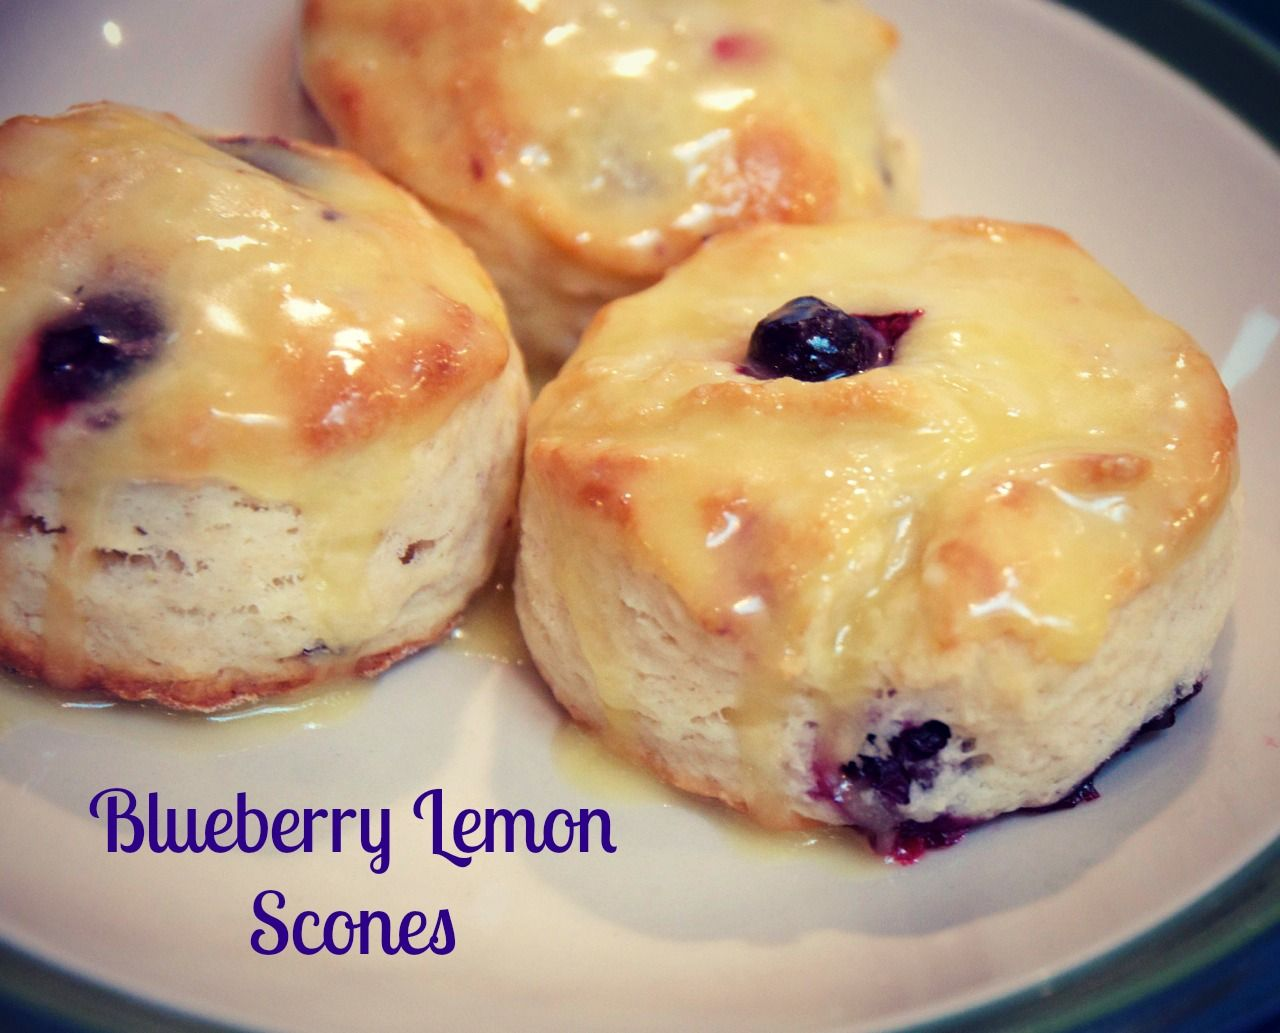 Blueberry Lemon Scones - one of my favorite scone recipes